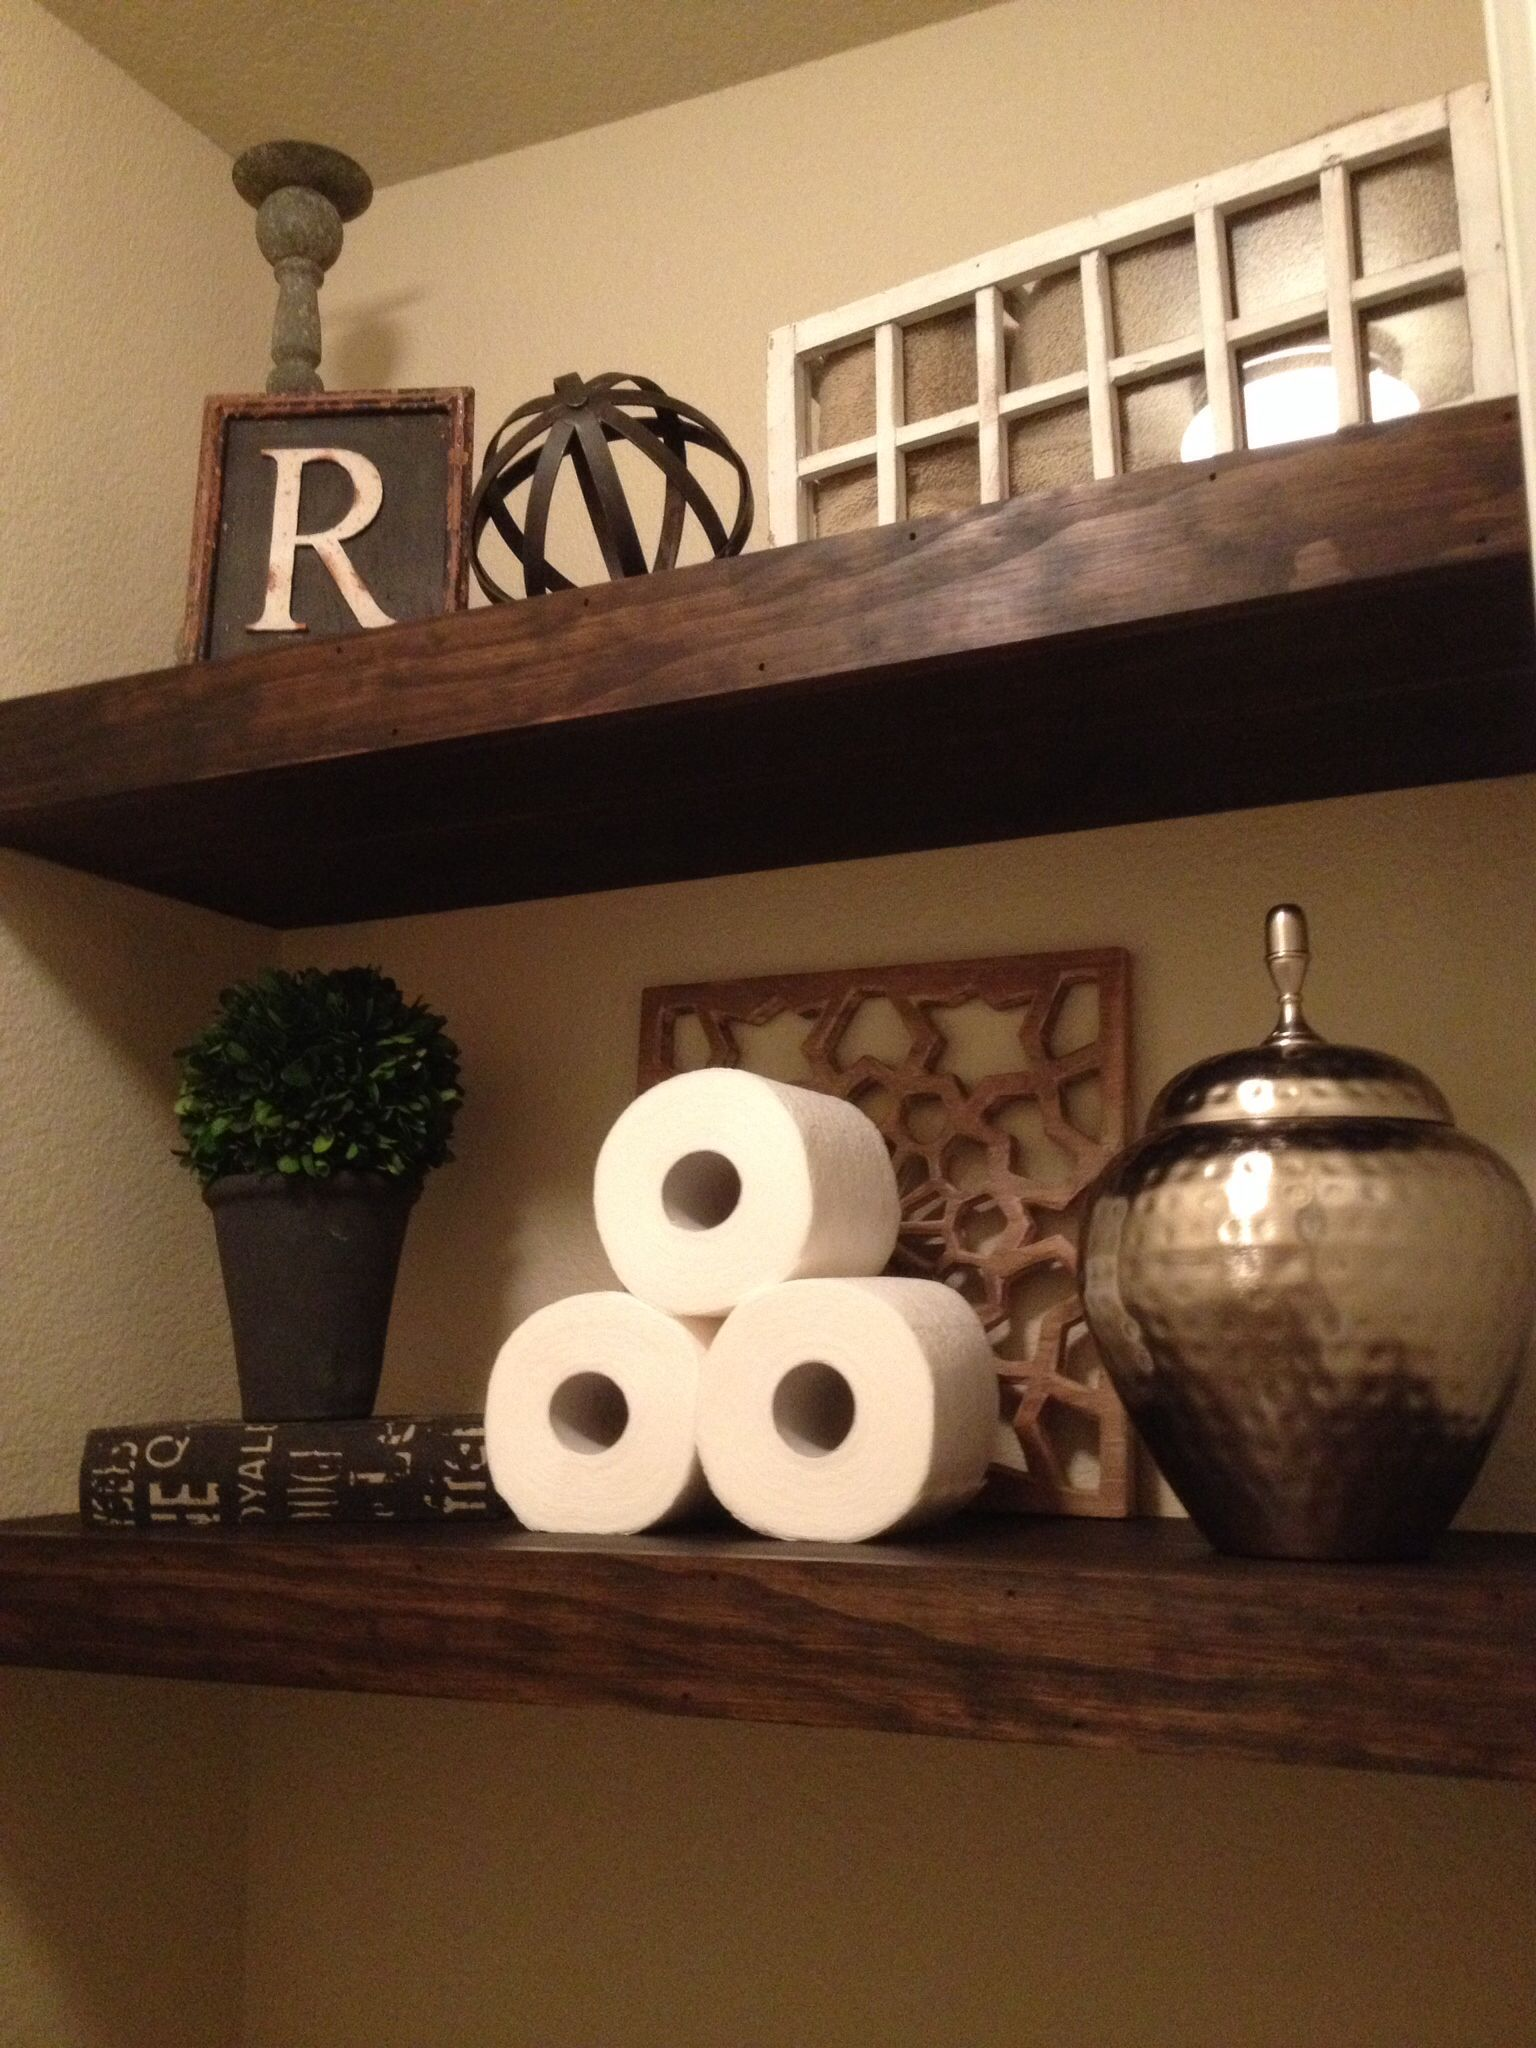 Shelves in my master bathroom water closet | Bathrooms | Pinterest ...